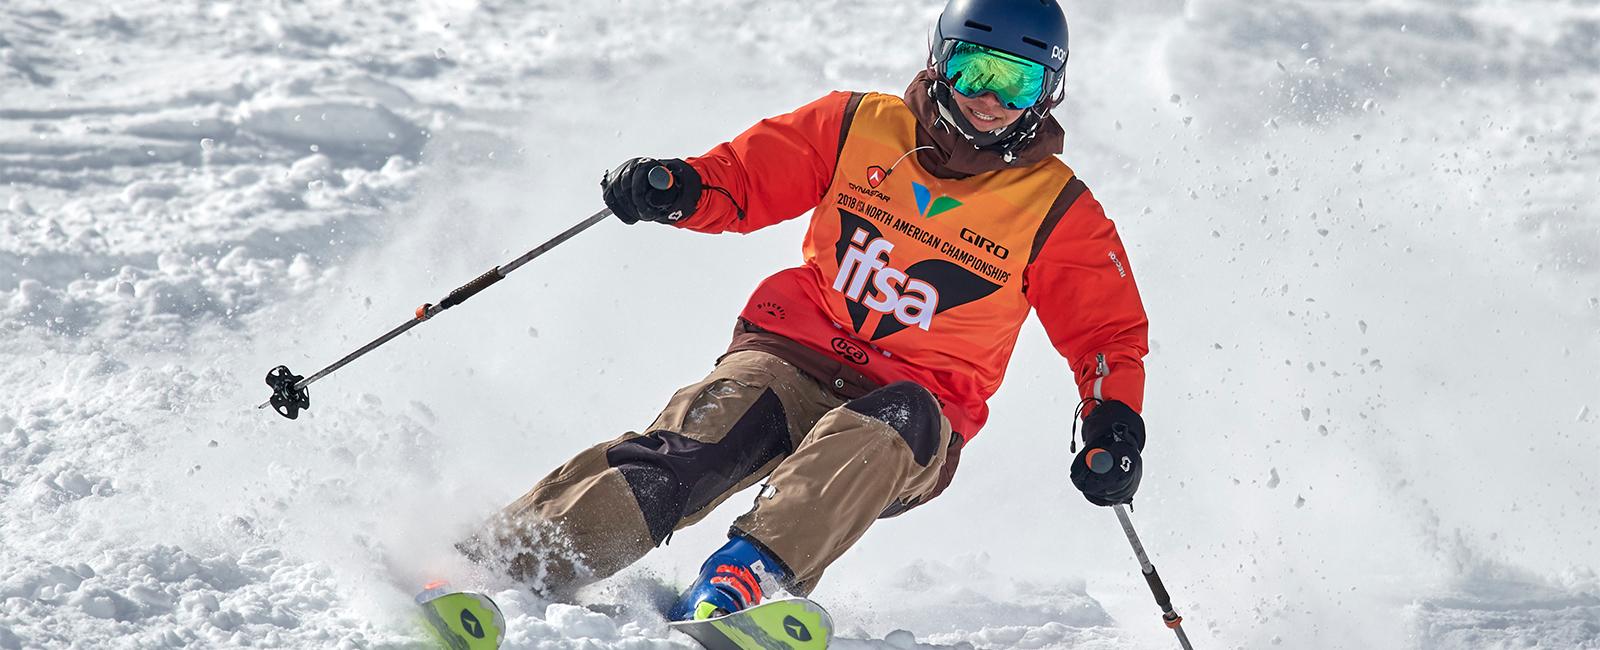 Meet The Future of Freeride Skiing & Snowboarding